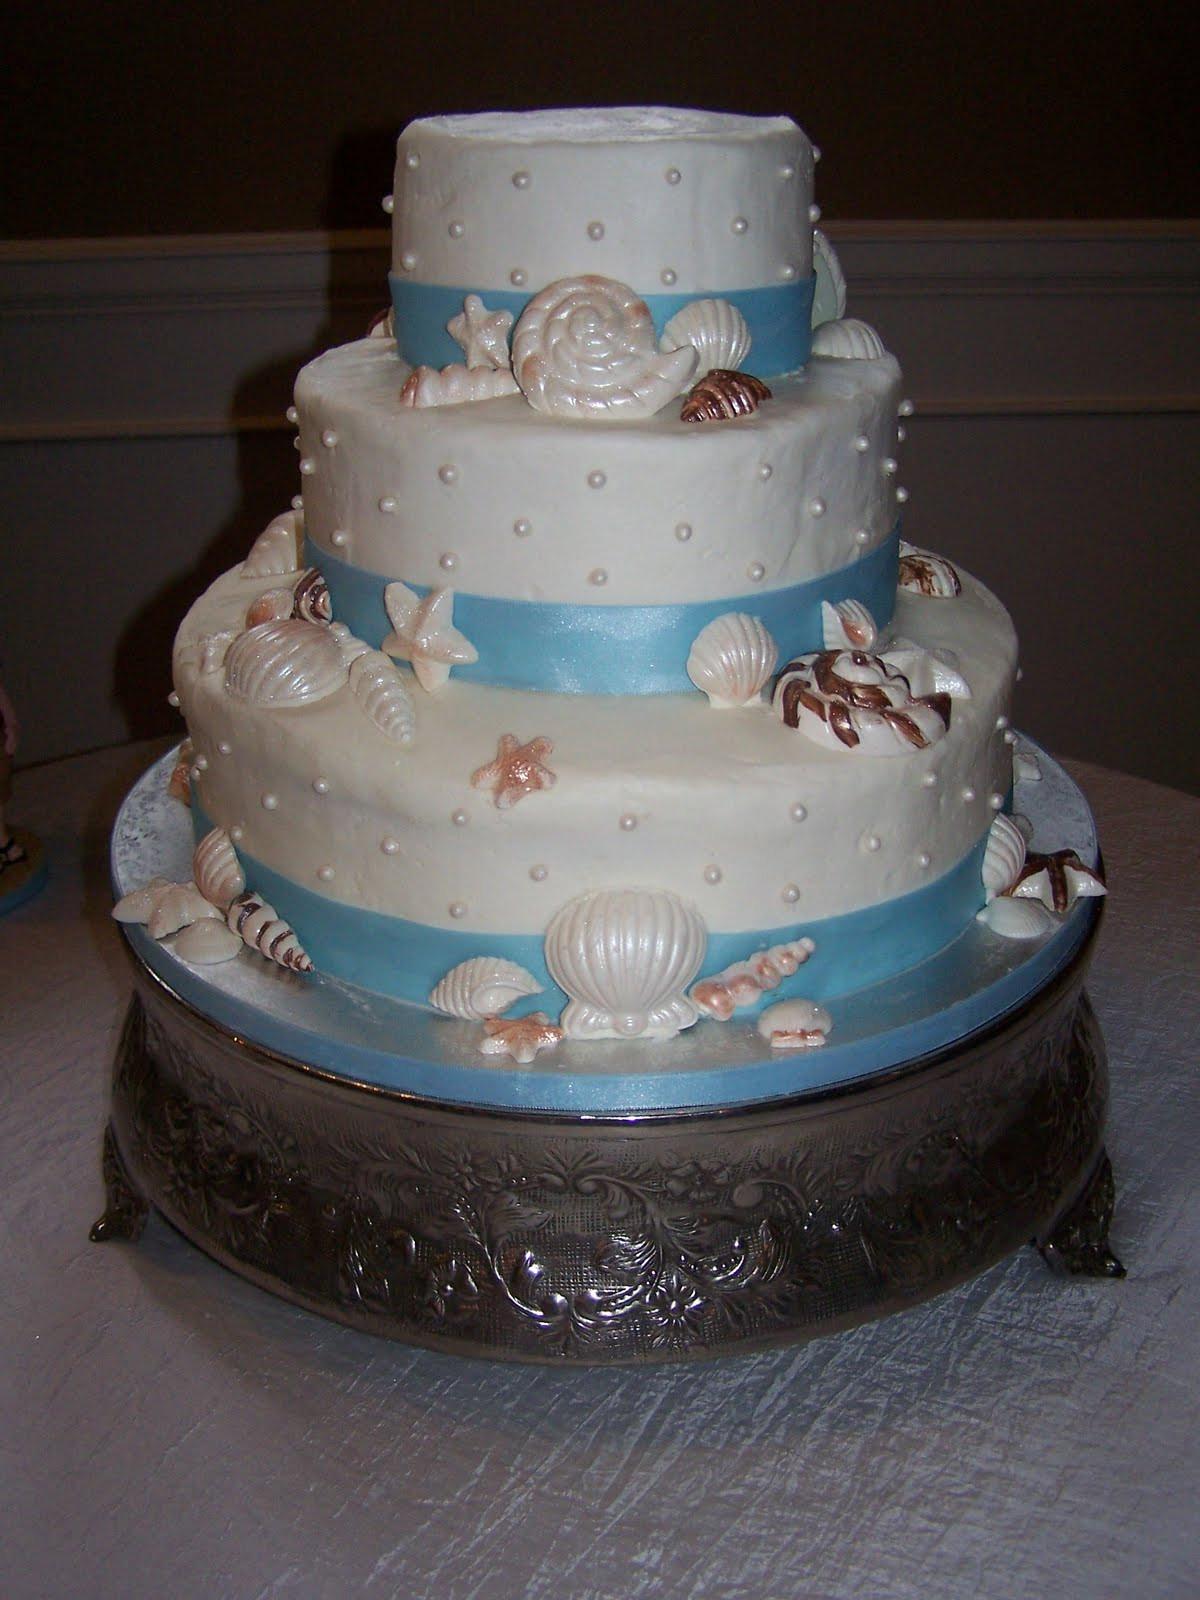 Wedding Cakes Beach Themed  Creative Cakes N More Beach Theme Wedding Cake